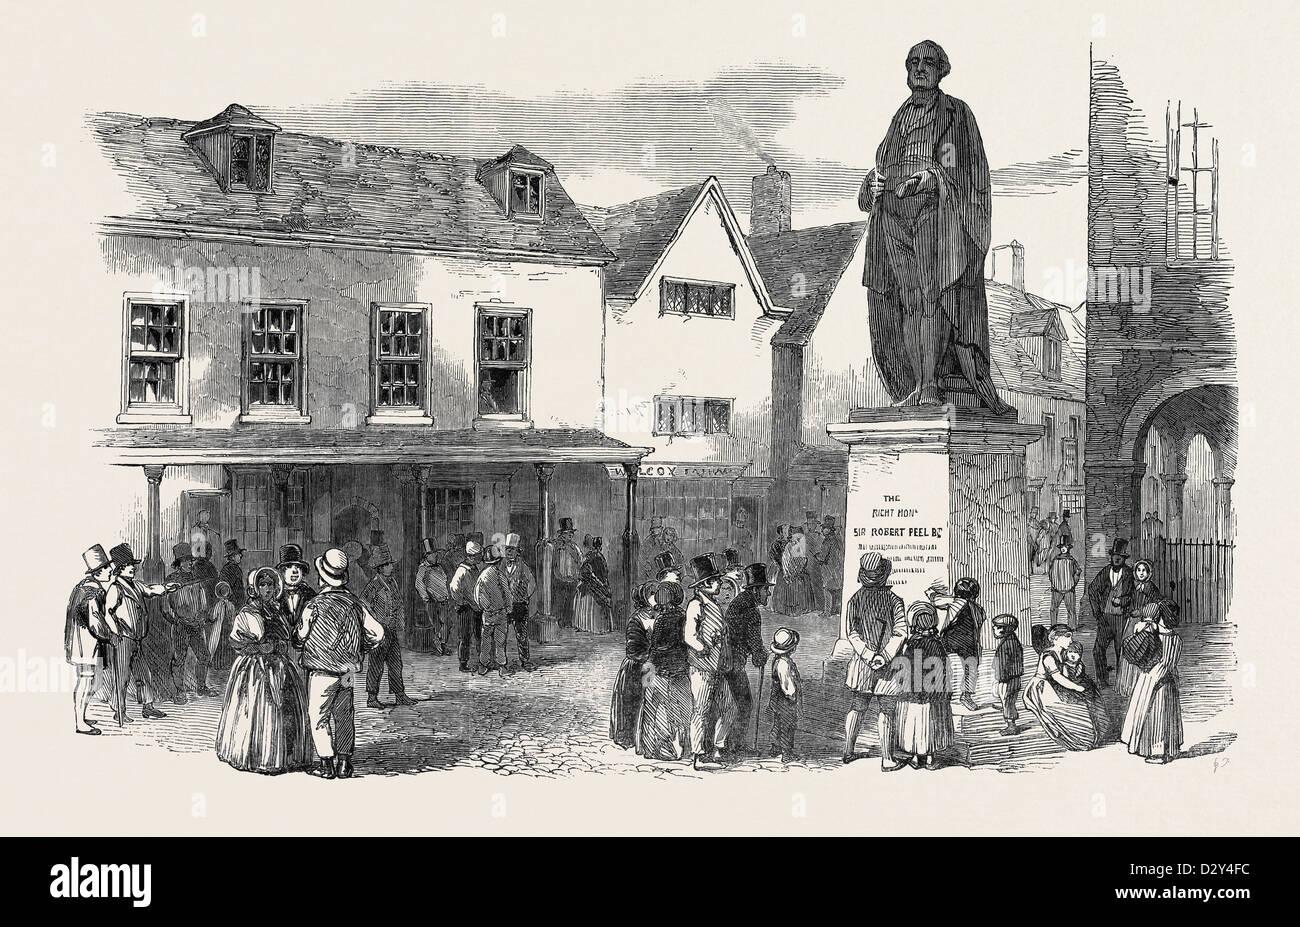 STATUE OF THE LATE SIR ROBERT PEEL, AT TAMWORTH - Stock Image